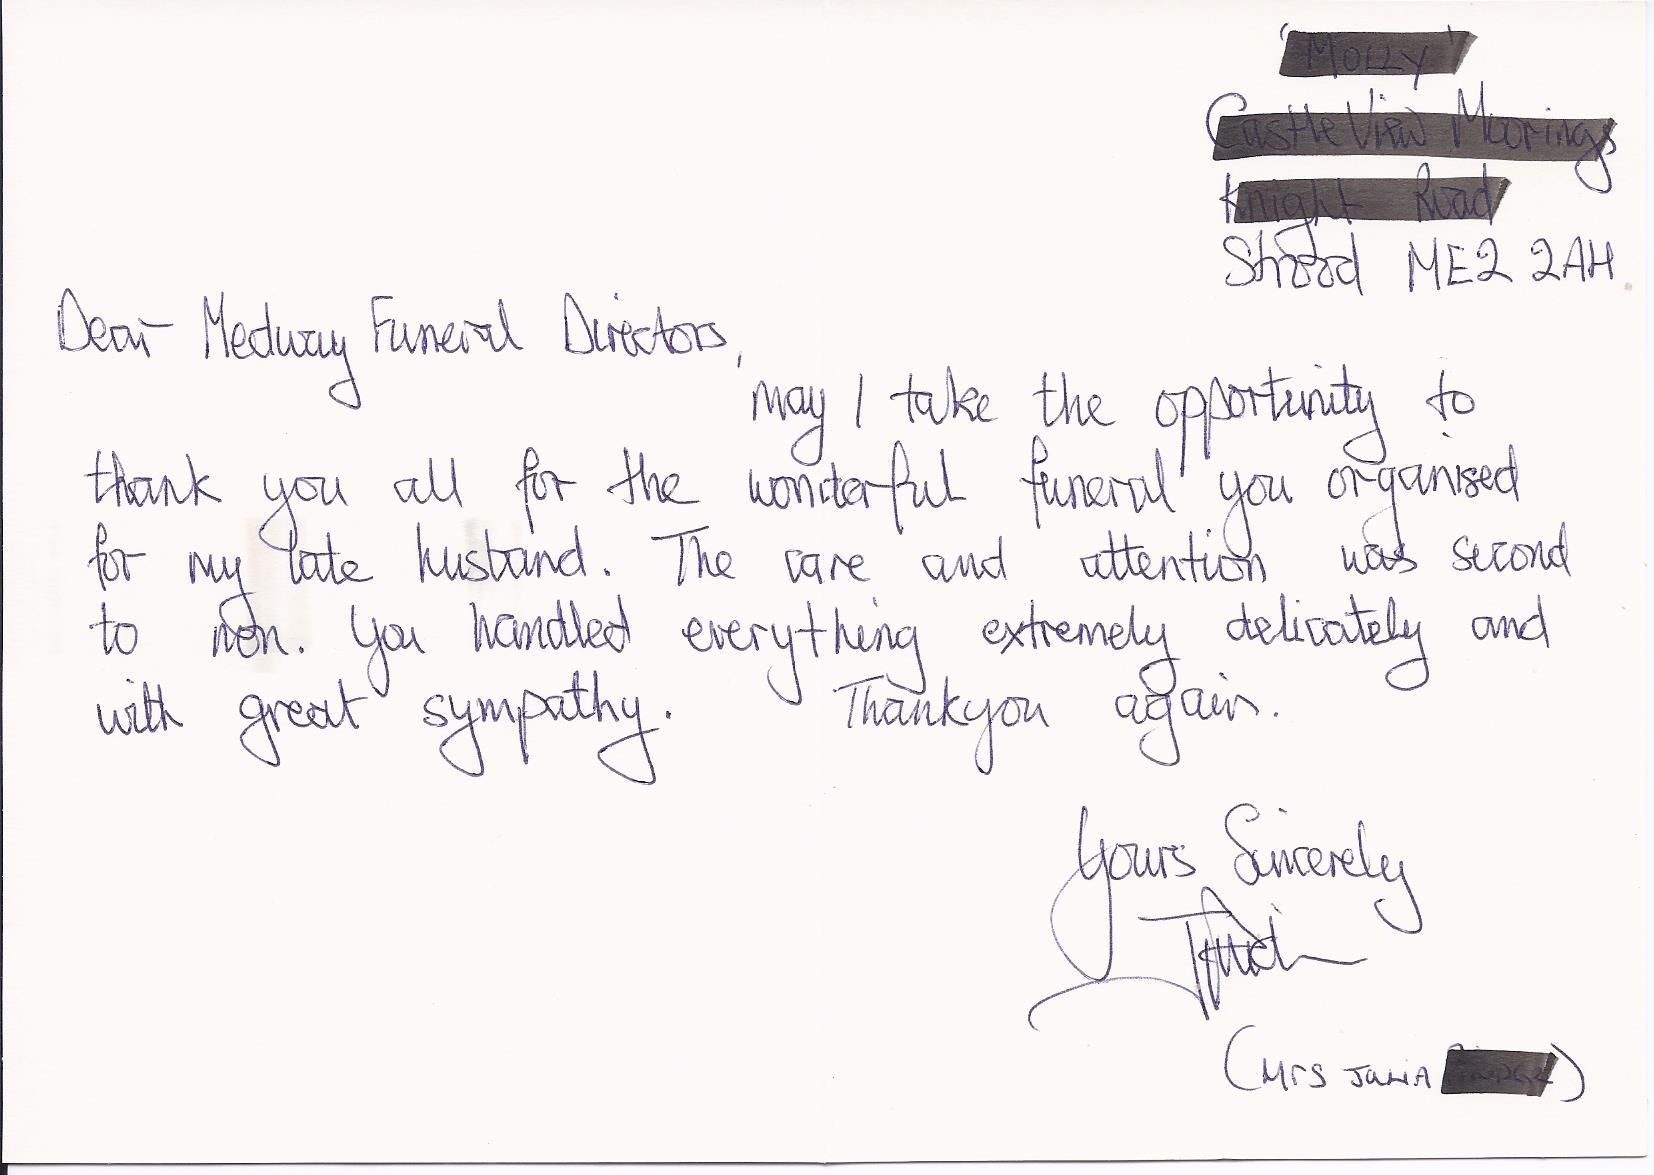 Testimonials Medway Funeral Directors